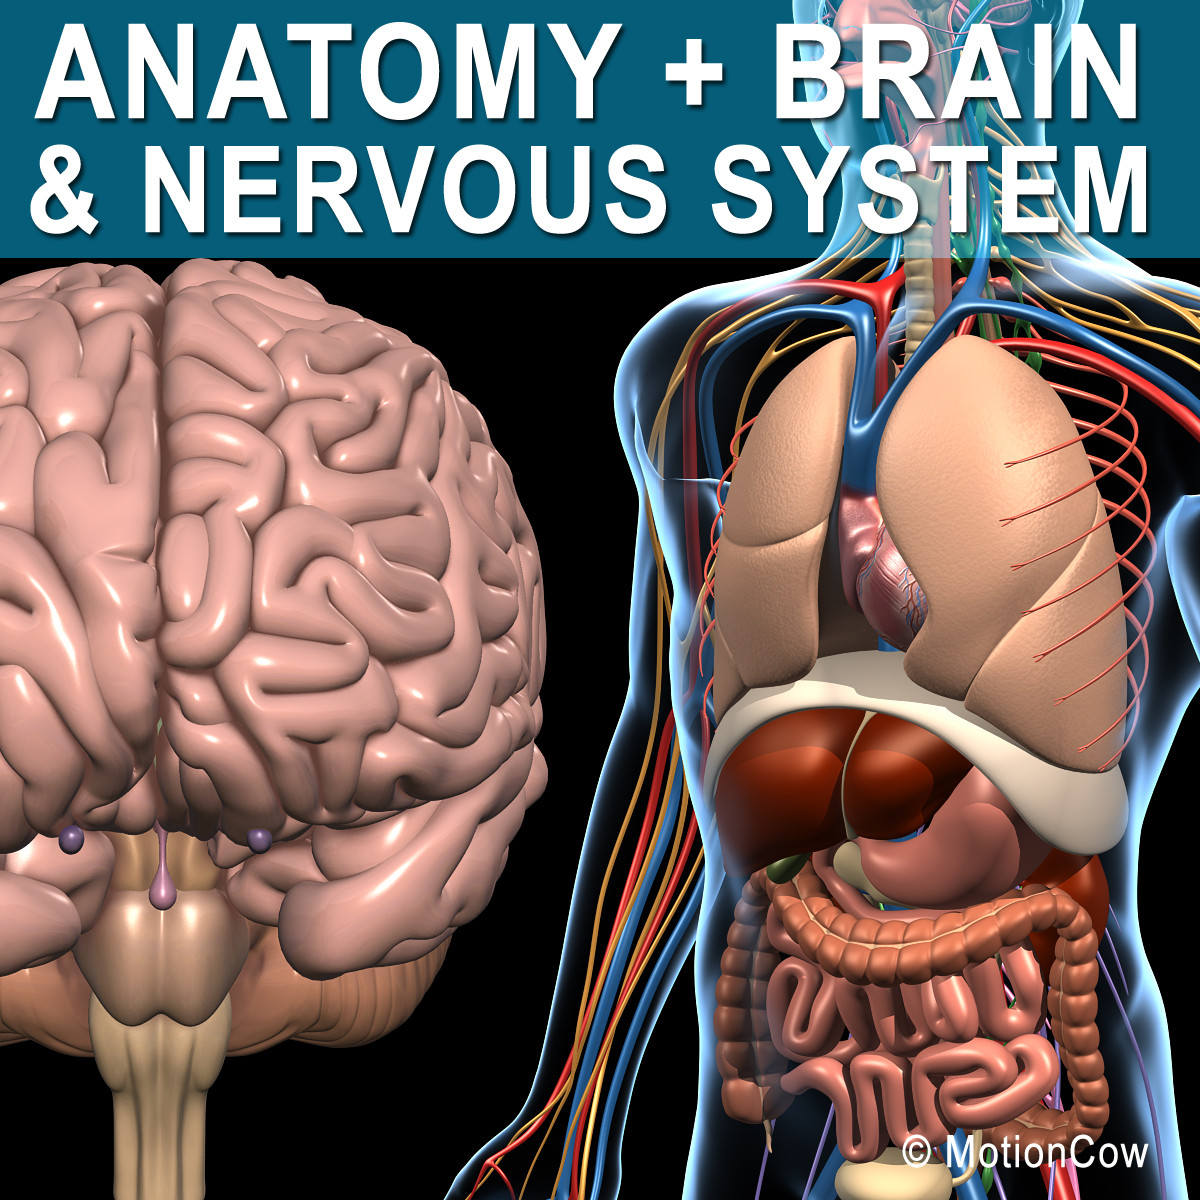 Anatomy_Brain_Nervous_A.jpg